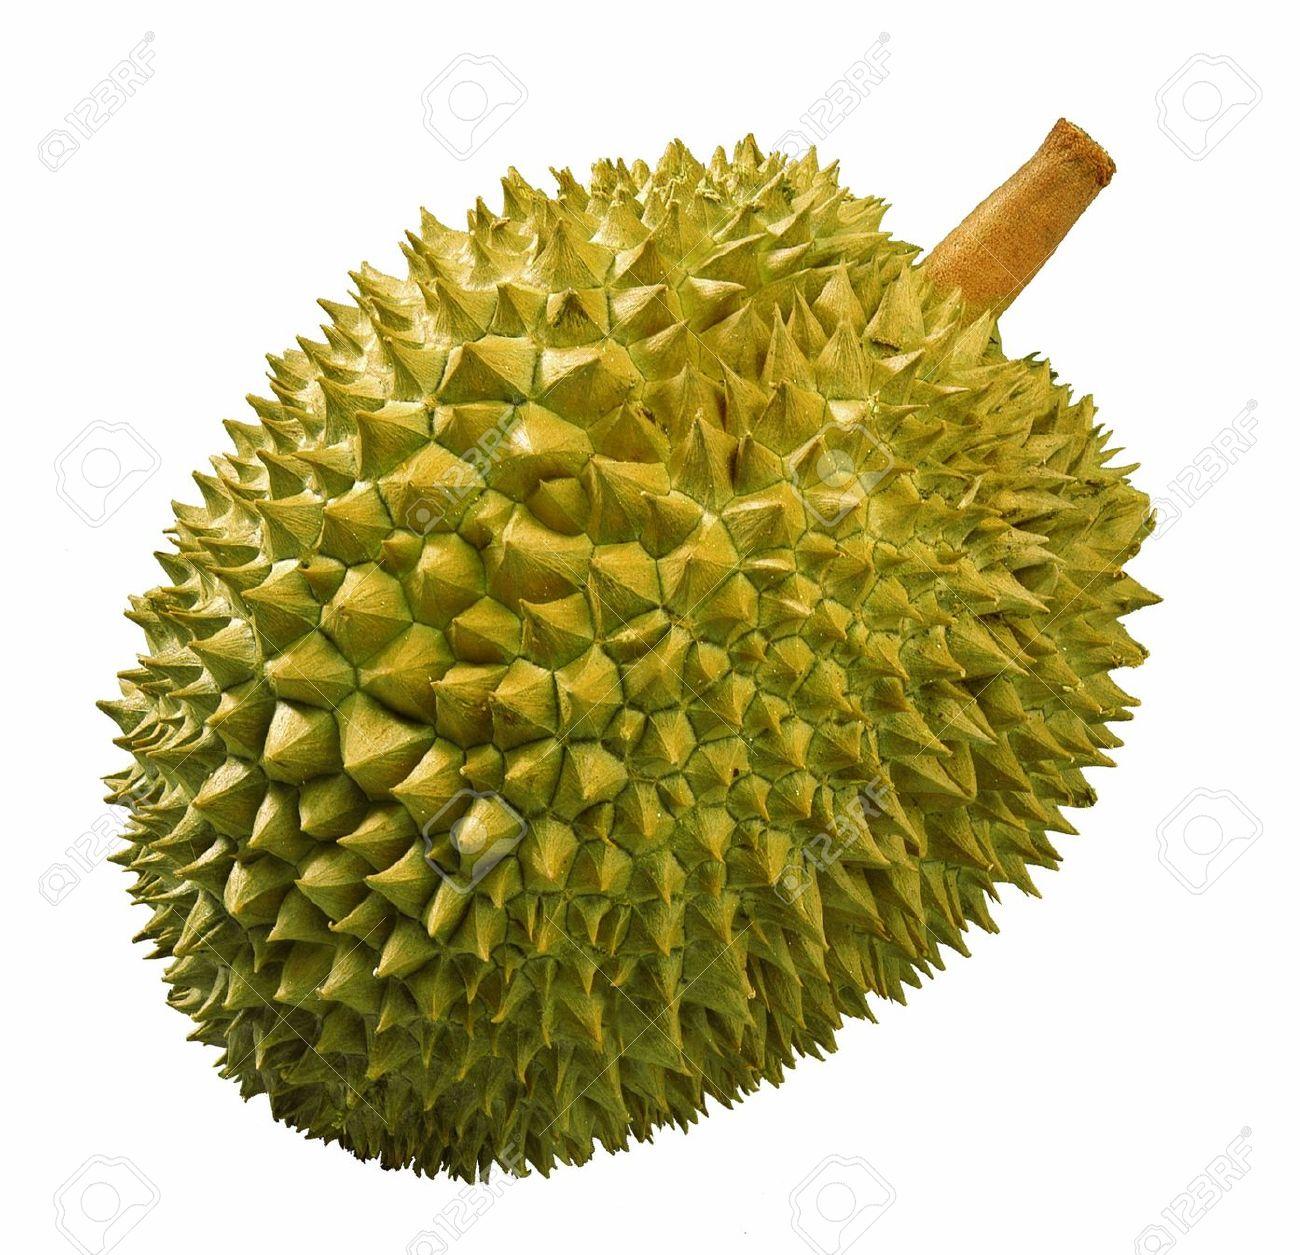 Clipart durian.